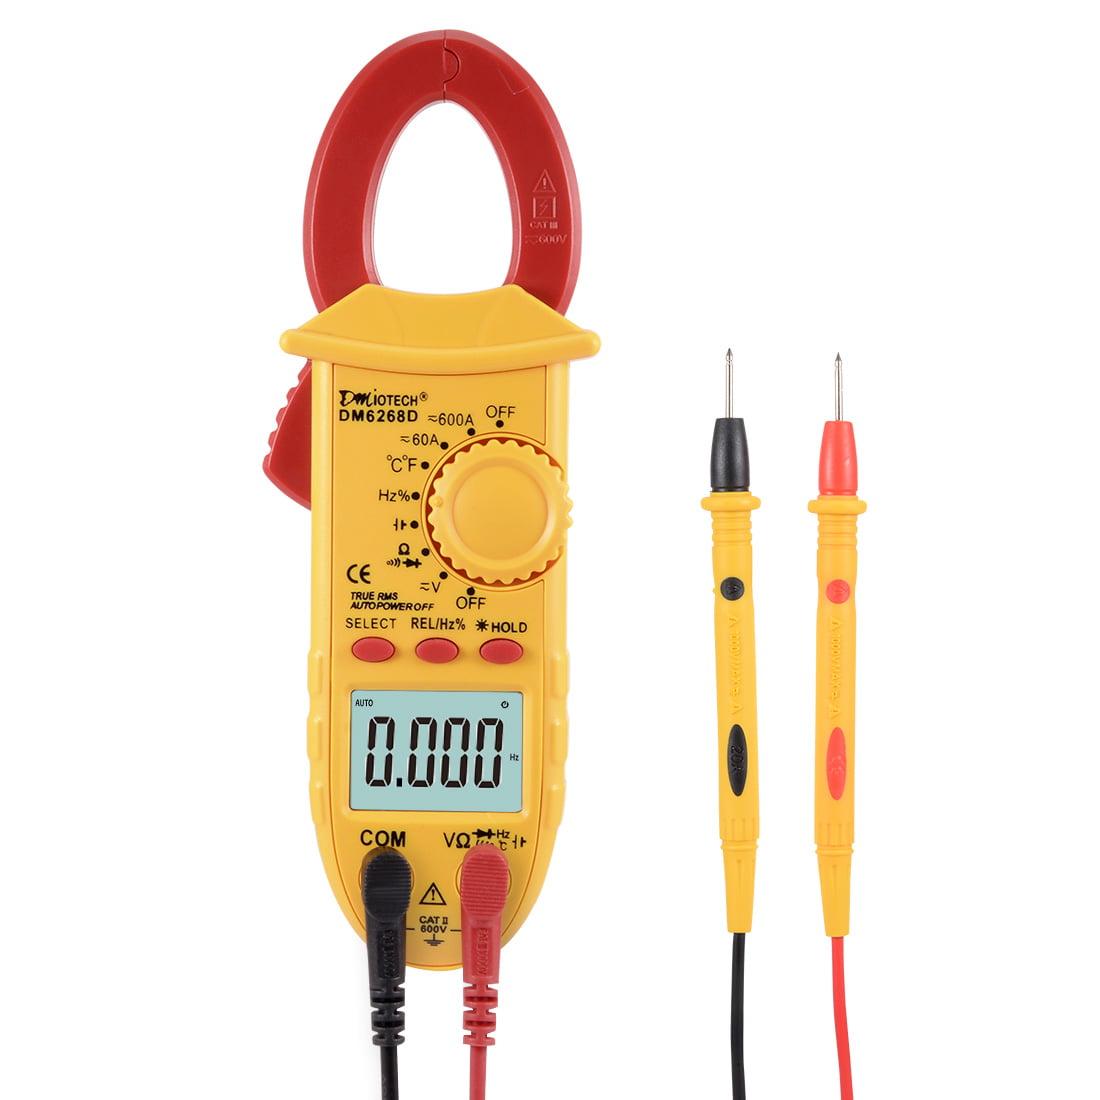 DMiotech Mini Multimeter AC DC Ammeter Voltage ACV DCV Capacitance Clamp Meter by